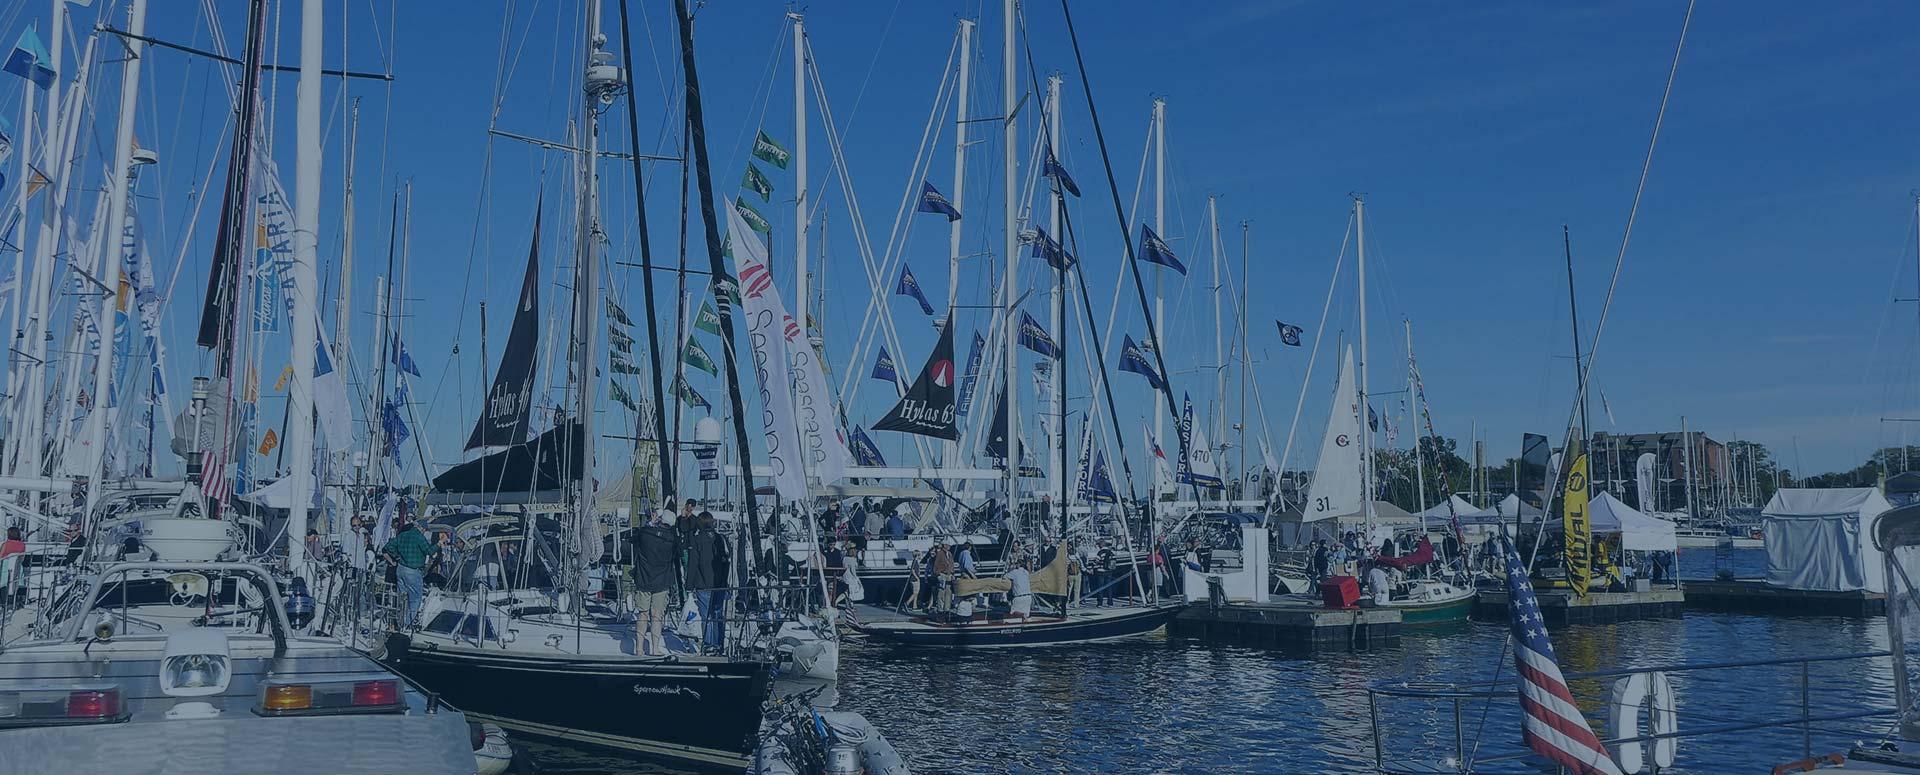 Annapolis Boat Show 2020.Tradewinds Desktop Edition